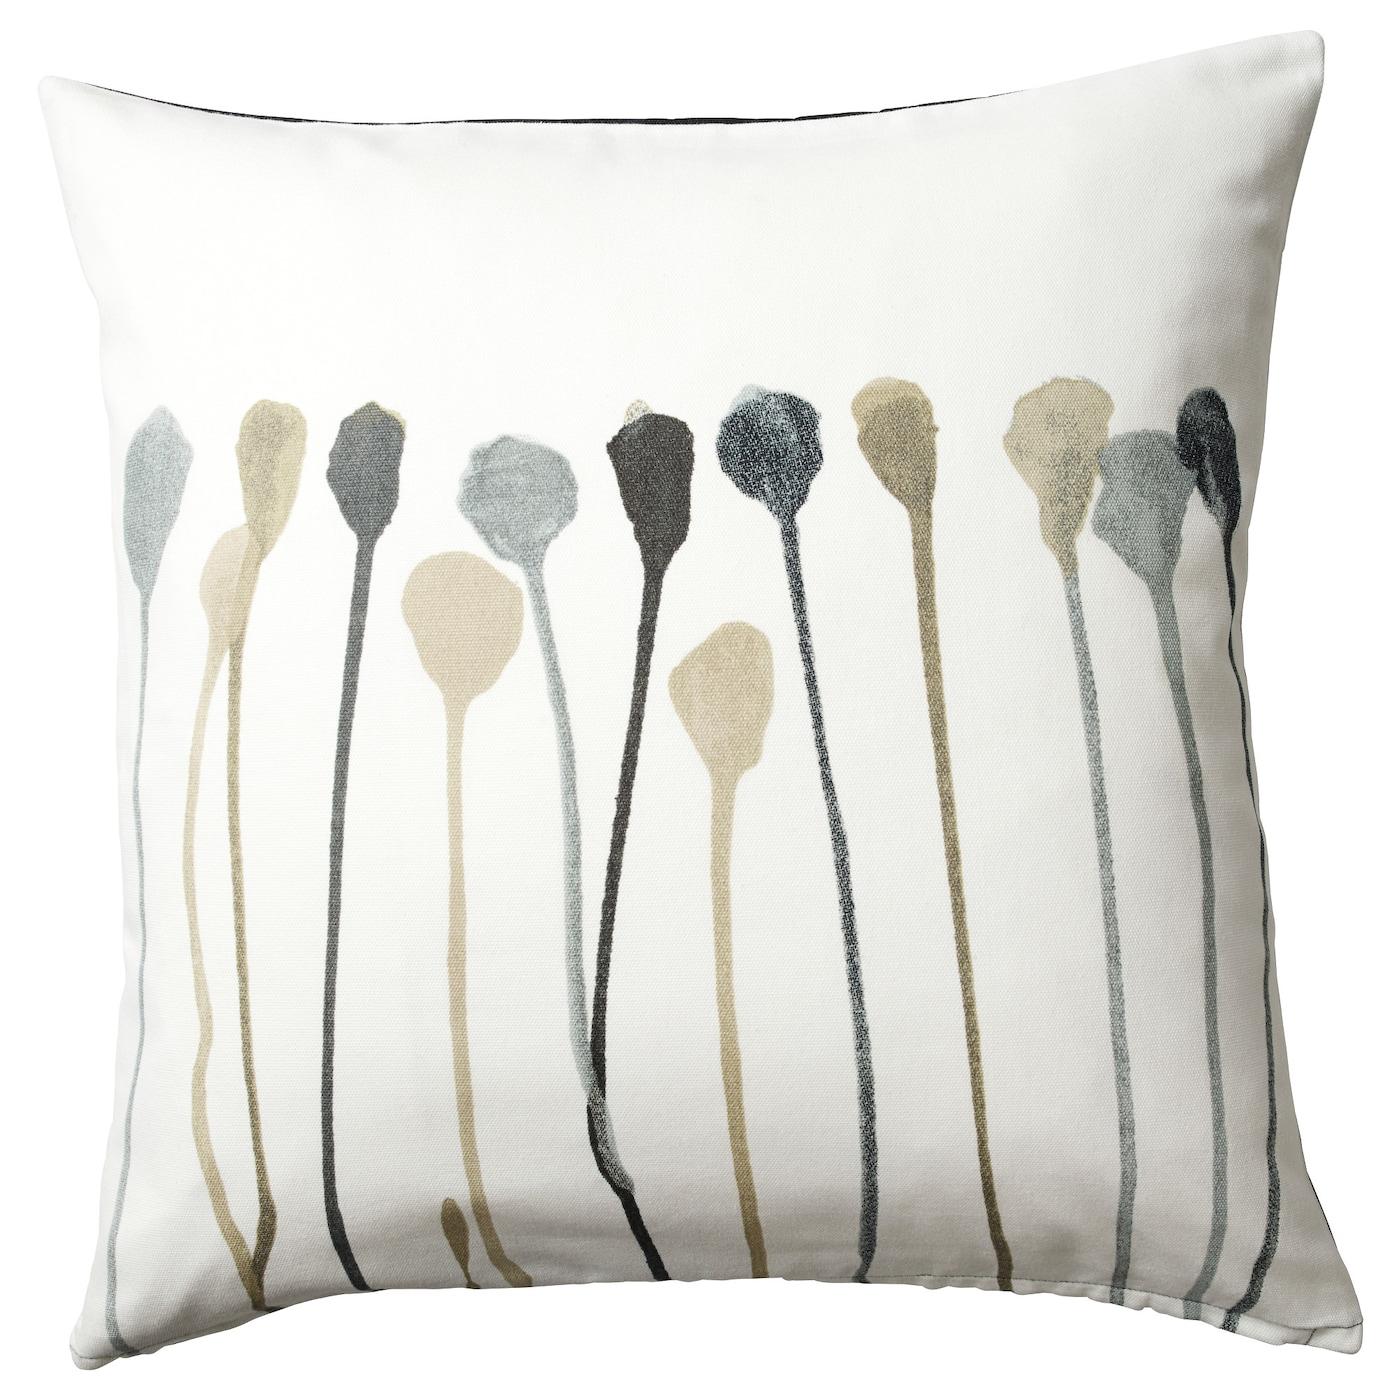 skogsn va housse de coussin gris beige 50x50 cm ikea. Black Bedroom Furniture Sets. Home Design Ideas